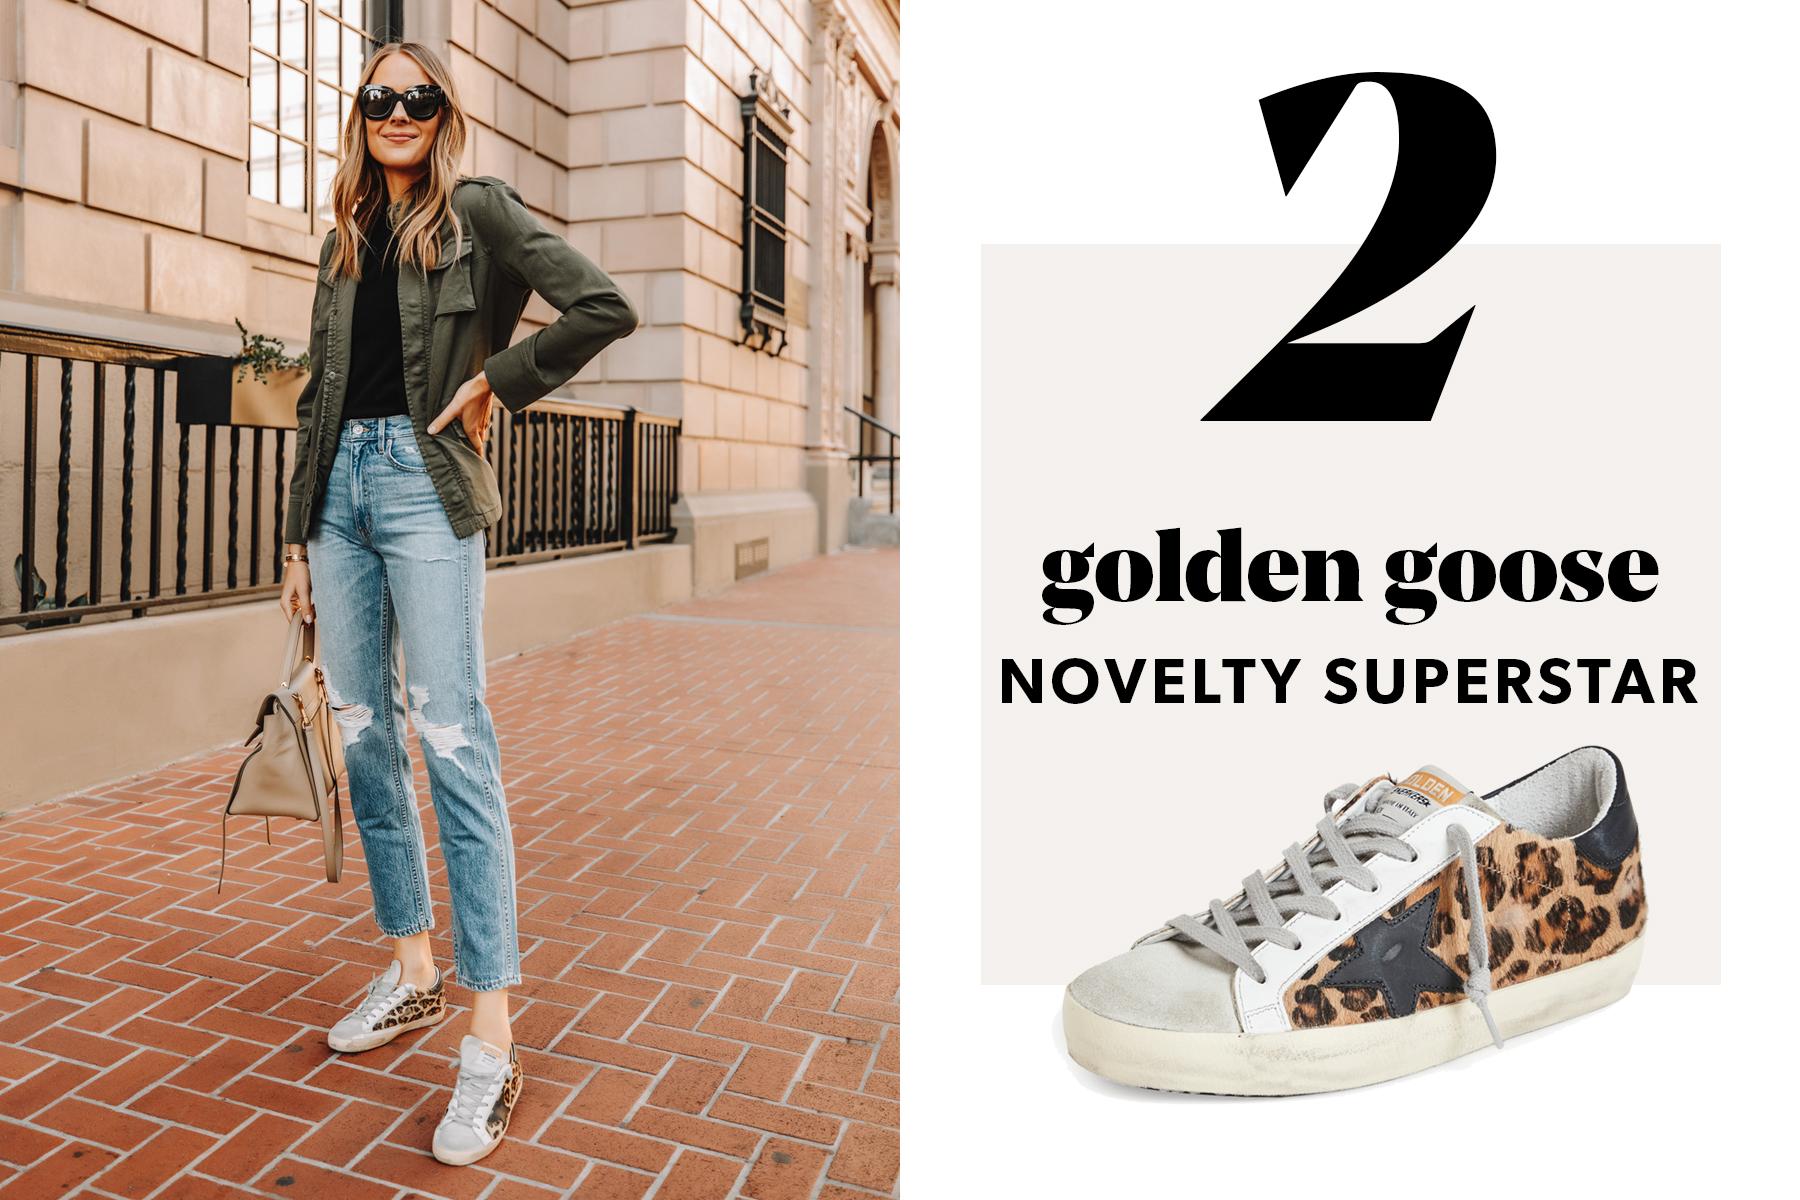 fashion jackson wearing golden goose purestar sneakers